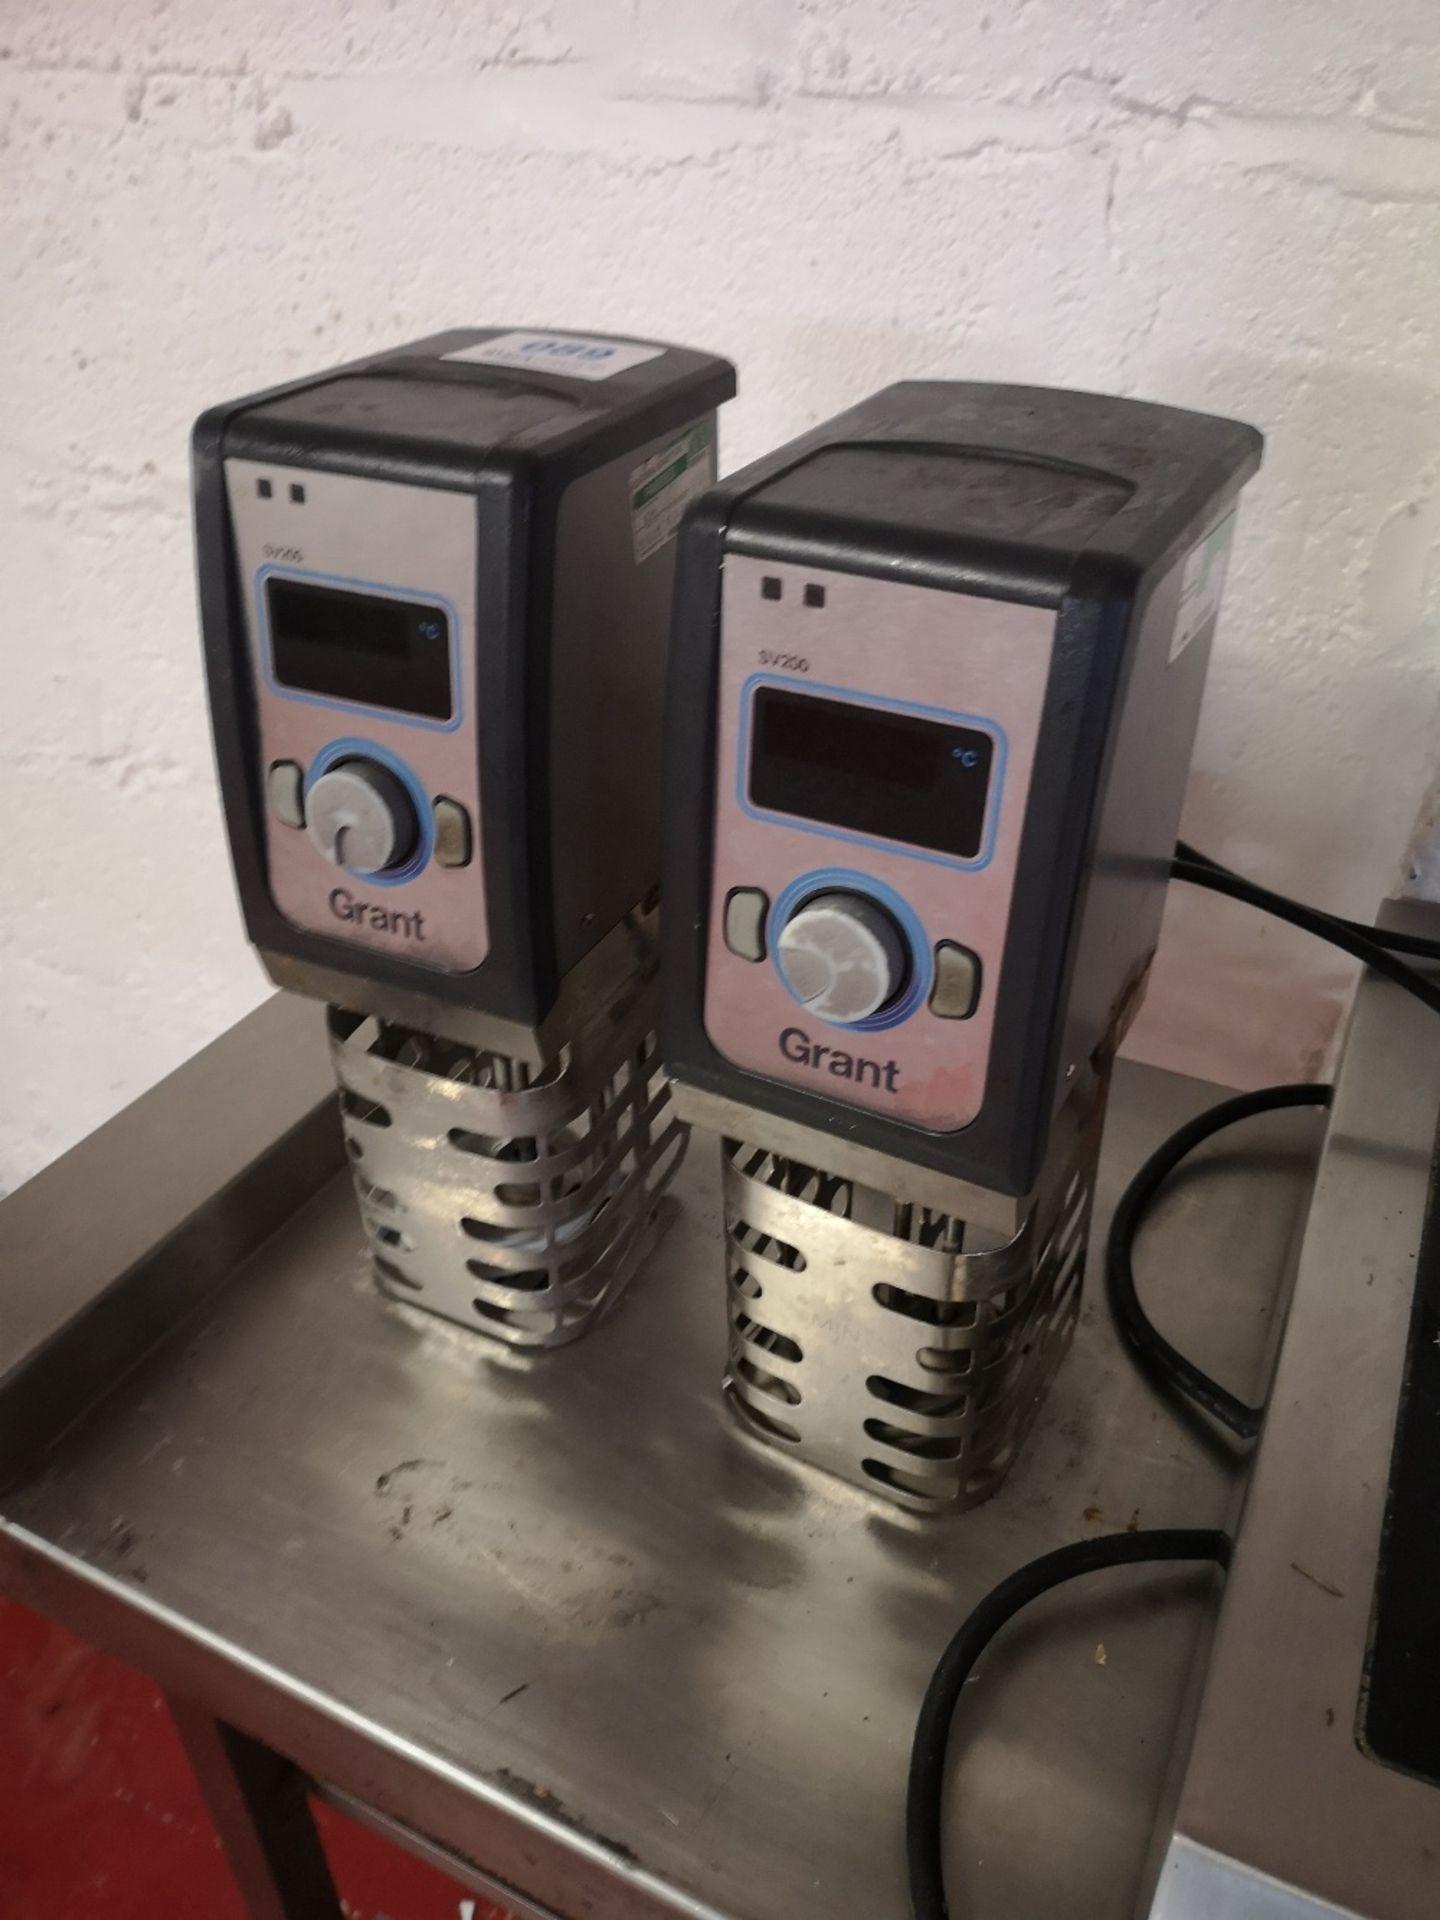 (2) Grant Instruments SV200 Portable Sous Vide Immersion Circulators - Image 2 of 5